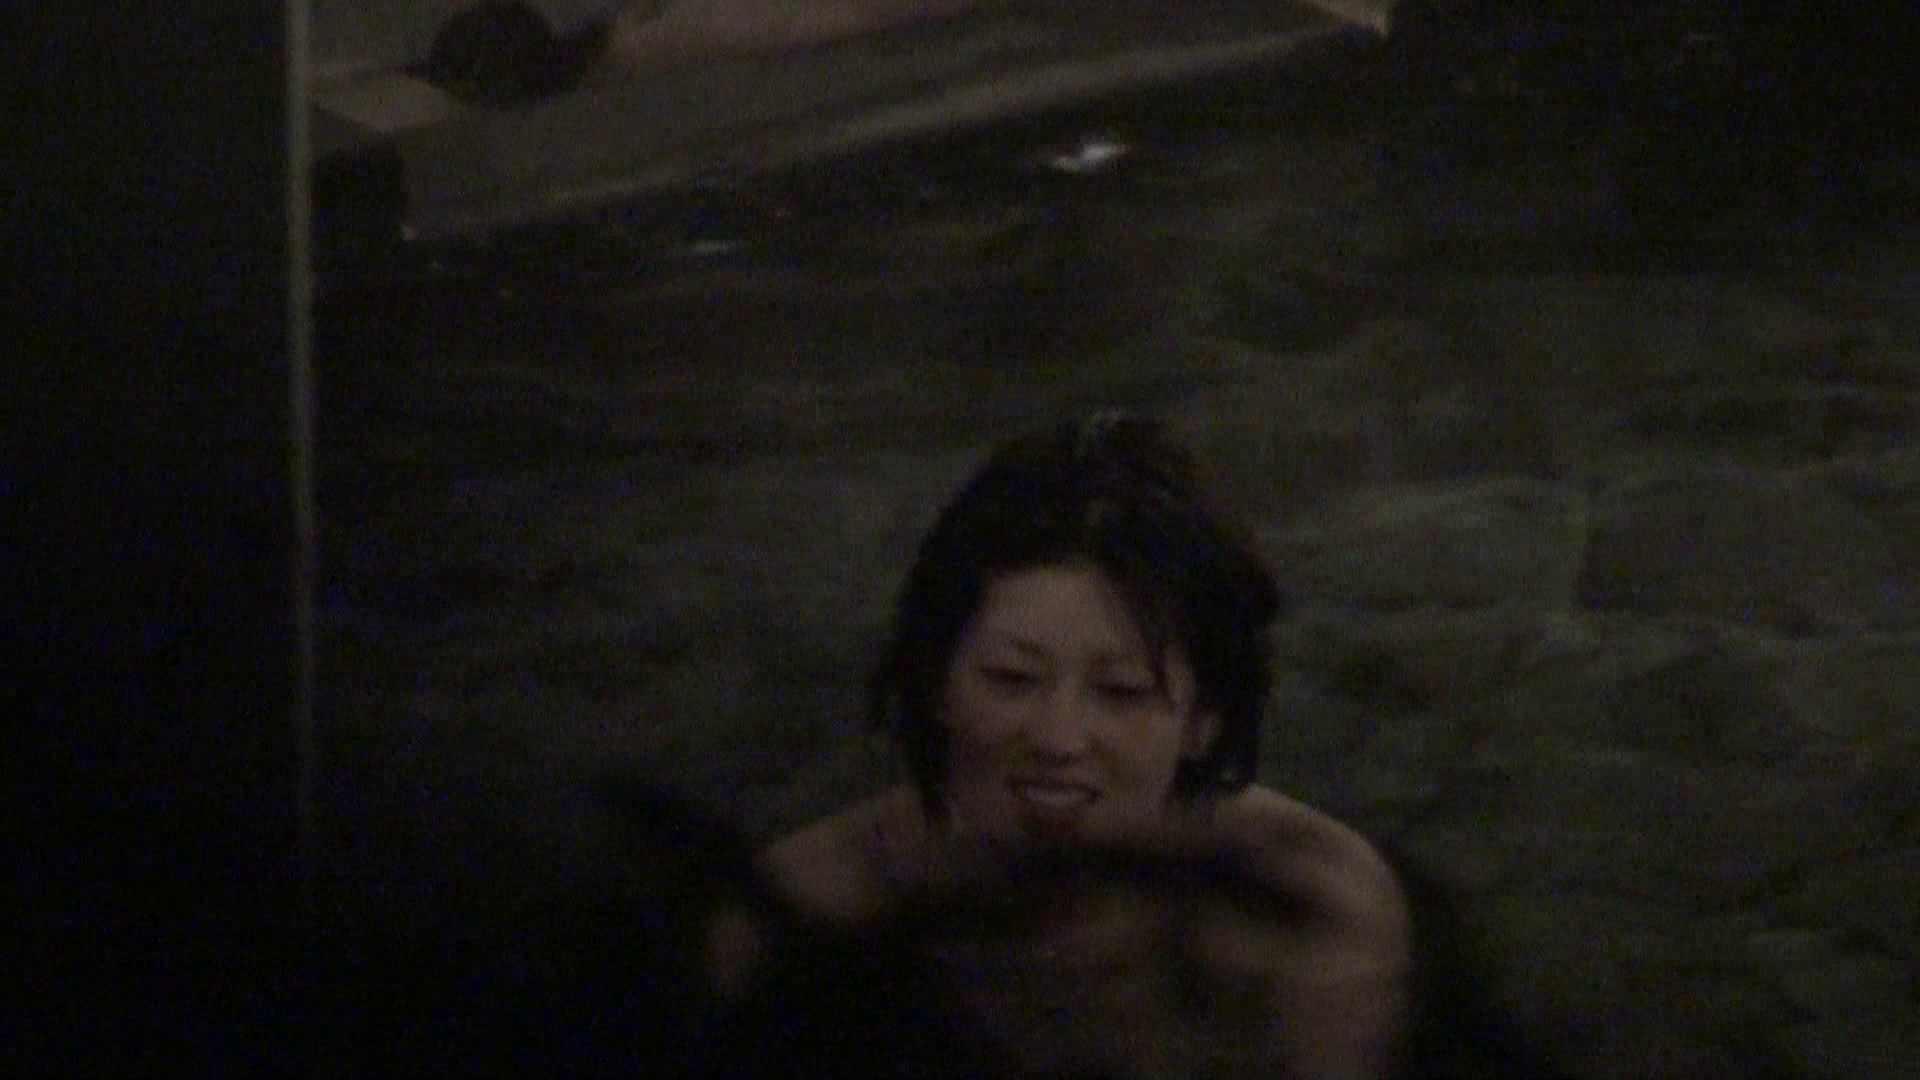 Aquaな露天風呂Vol.376 0   0  47連発 7